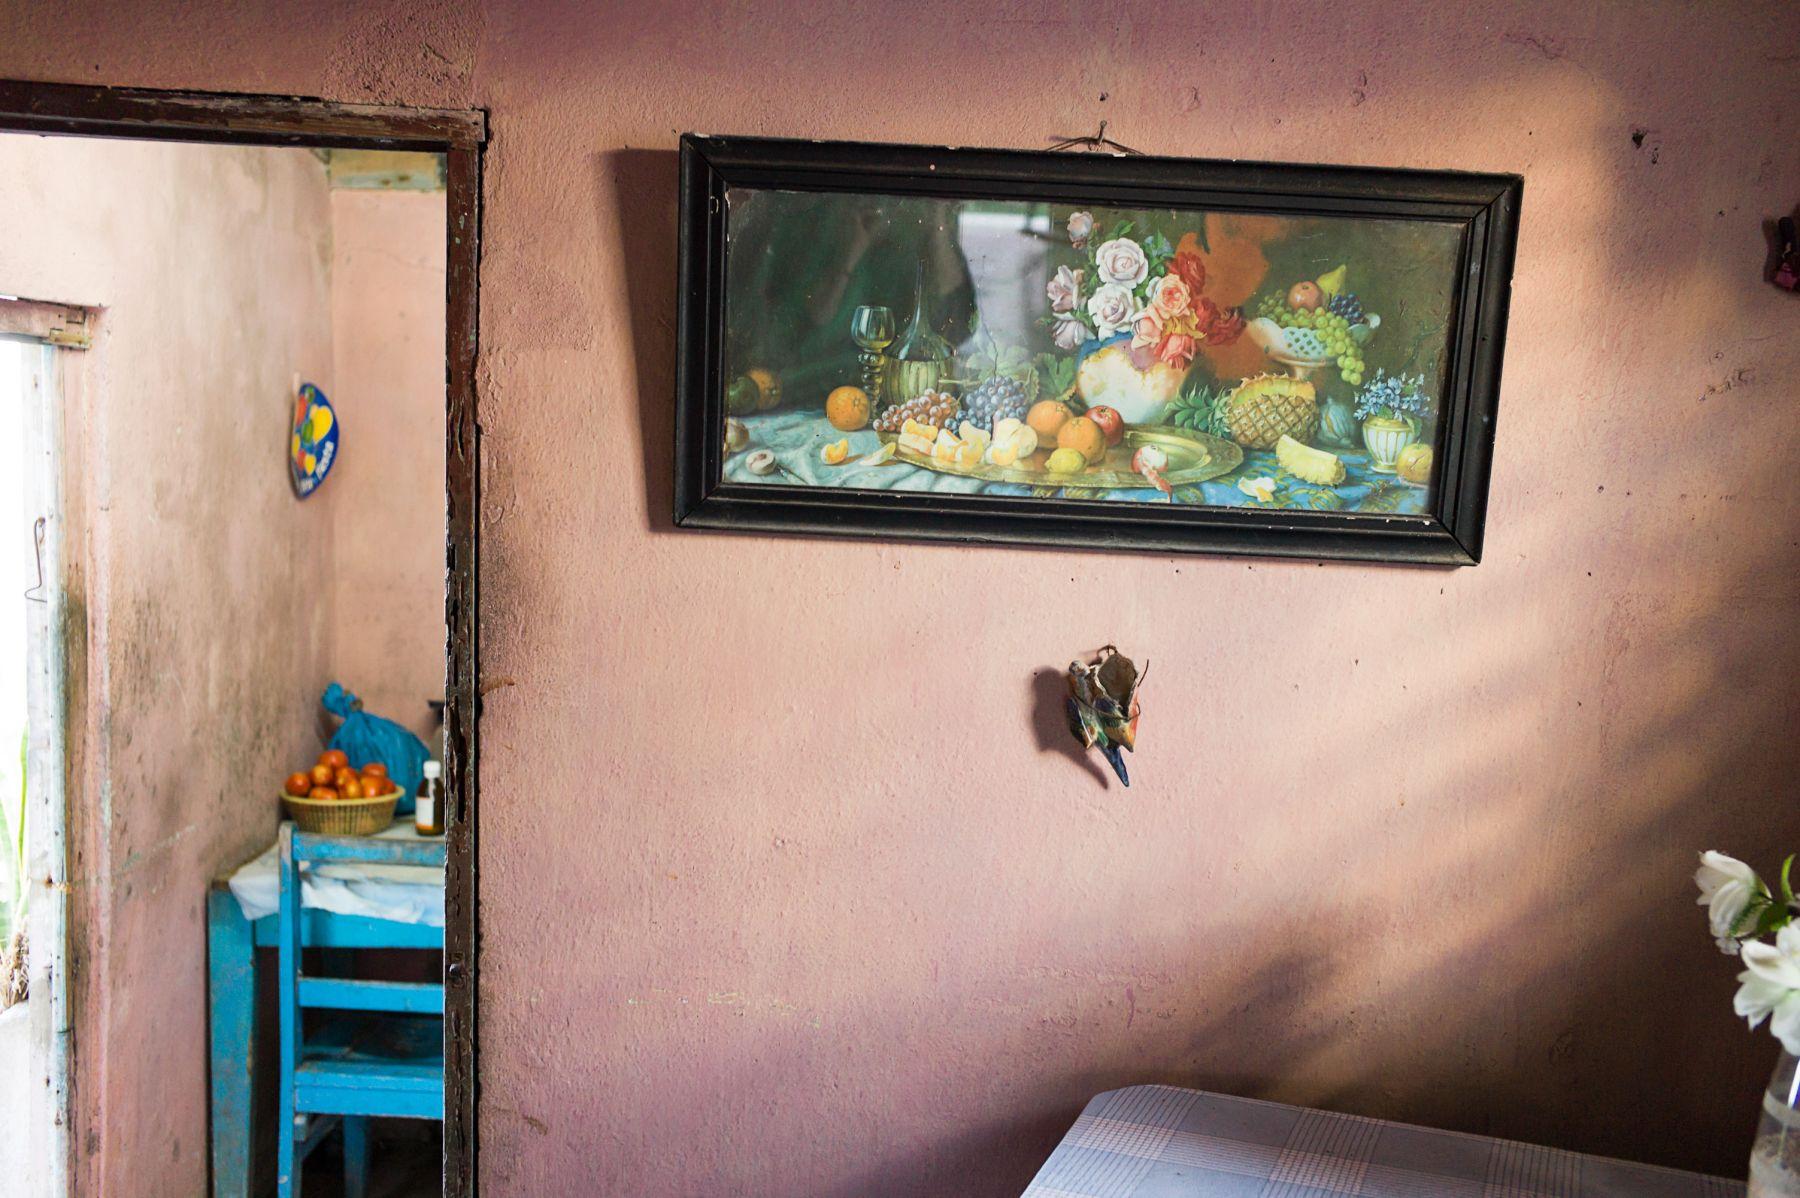 Magdalena Solé, Cuba - Hasta Siempre (Cuba Forever), Home in Pink, Gibara, 2013, Sous Les Etoiles Gallery